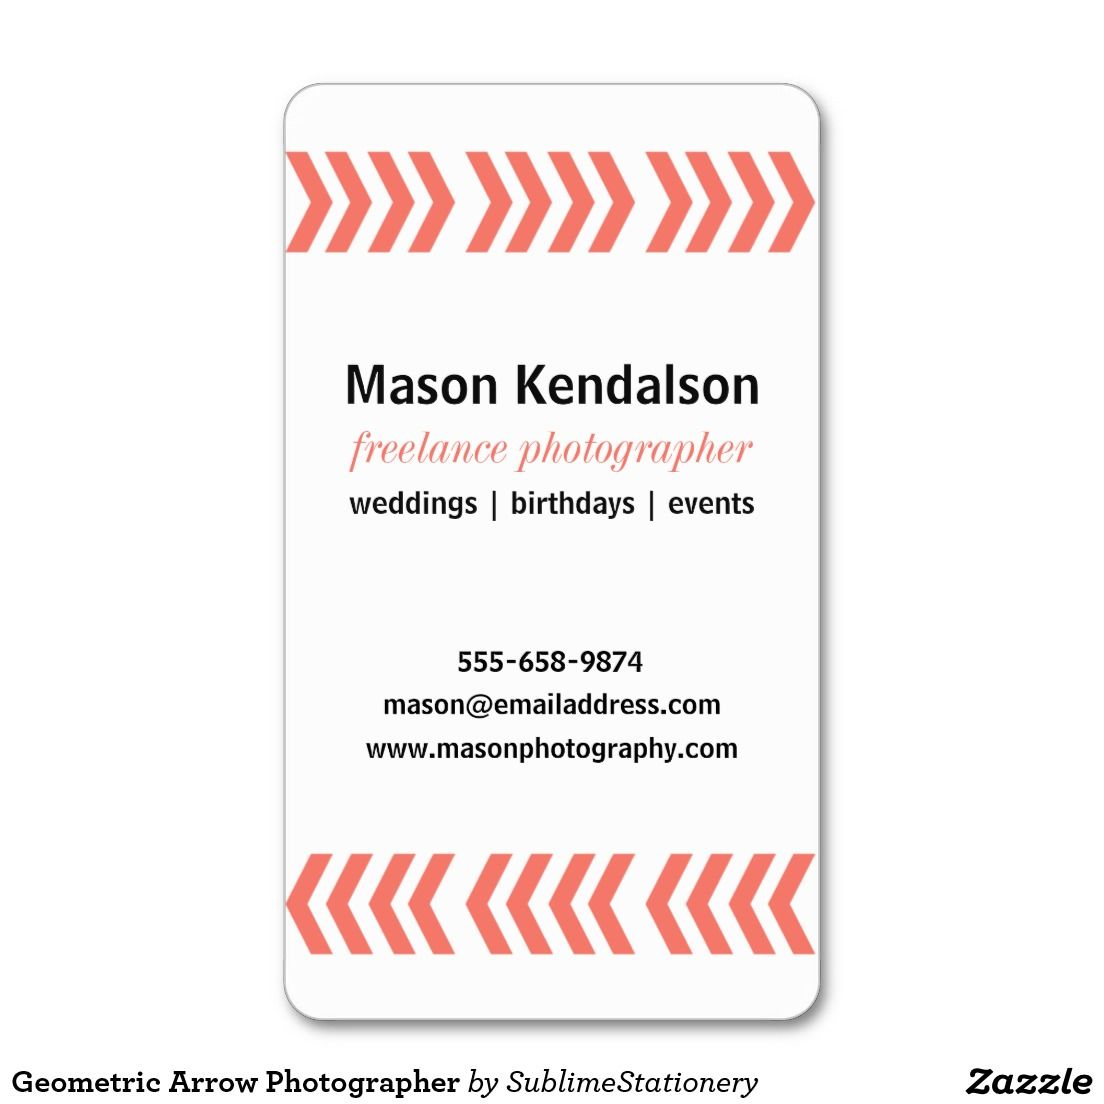 Geometric Arrow Photographer Business Card Geometric Arrow